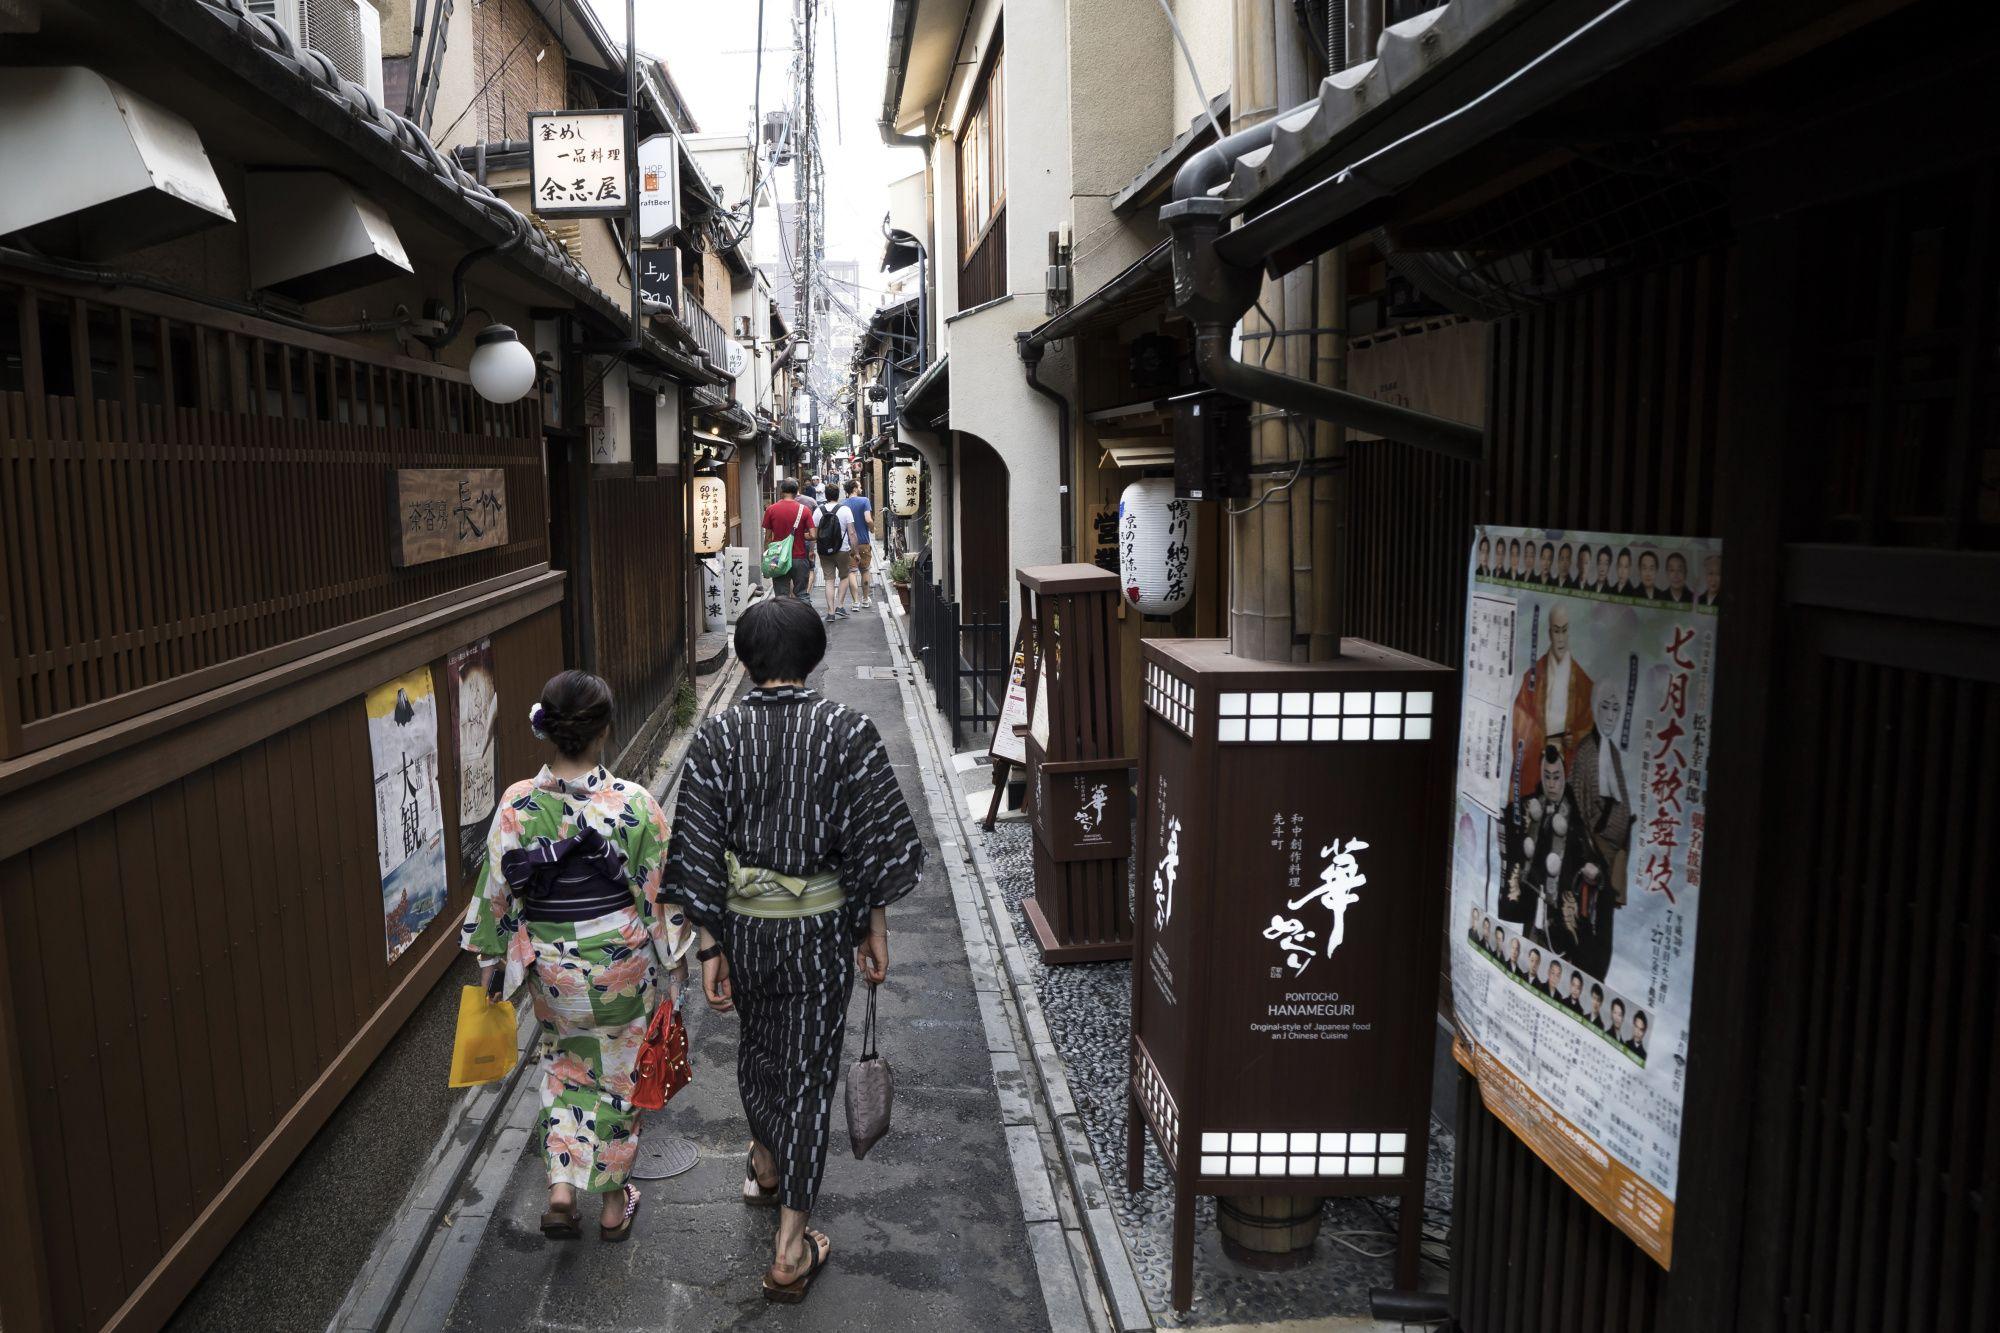 Ayai Tomisawa and Rie Morita, ©2019 Bloomberg L.P.